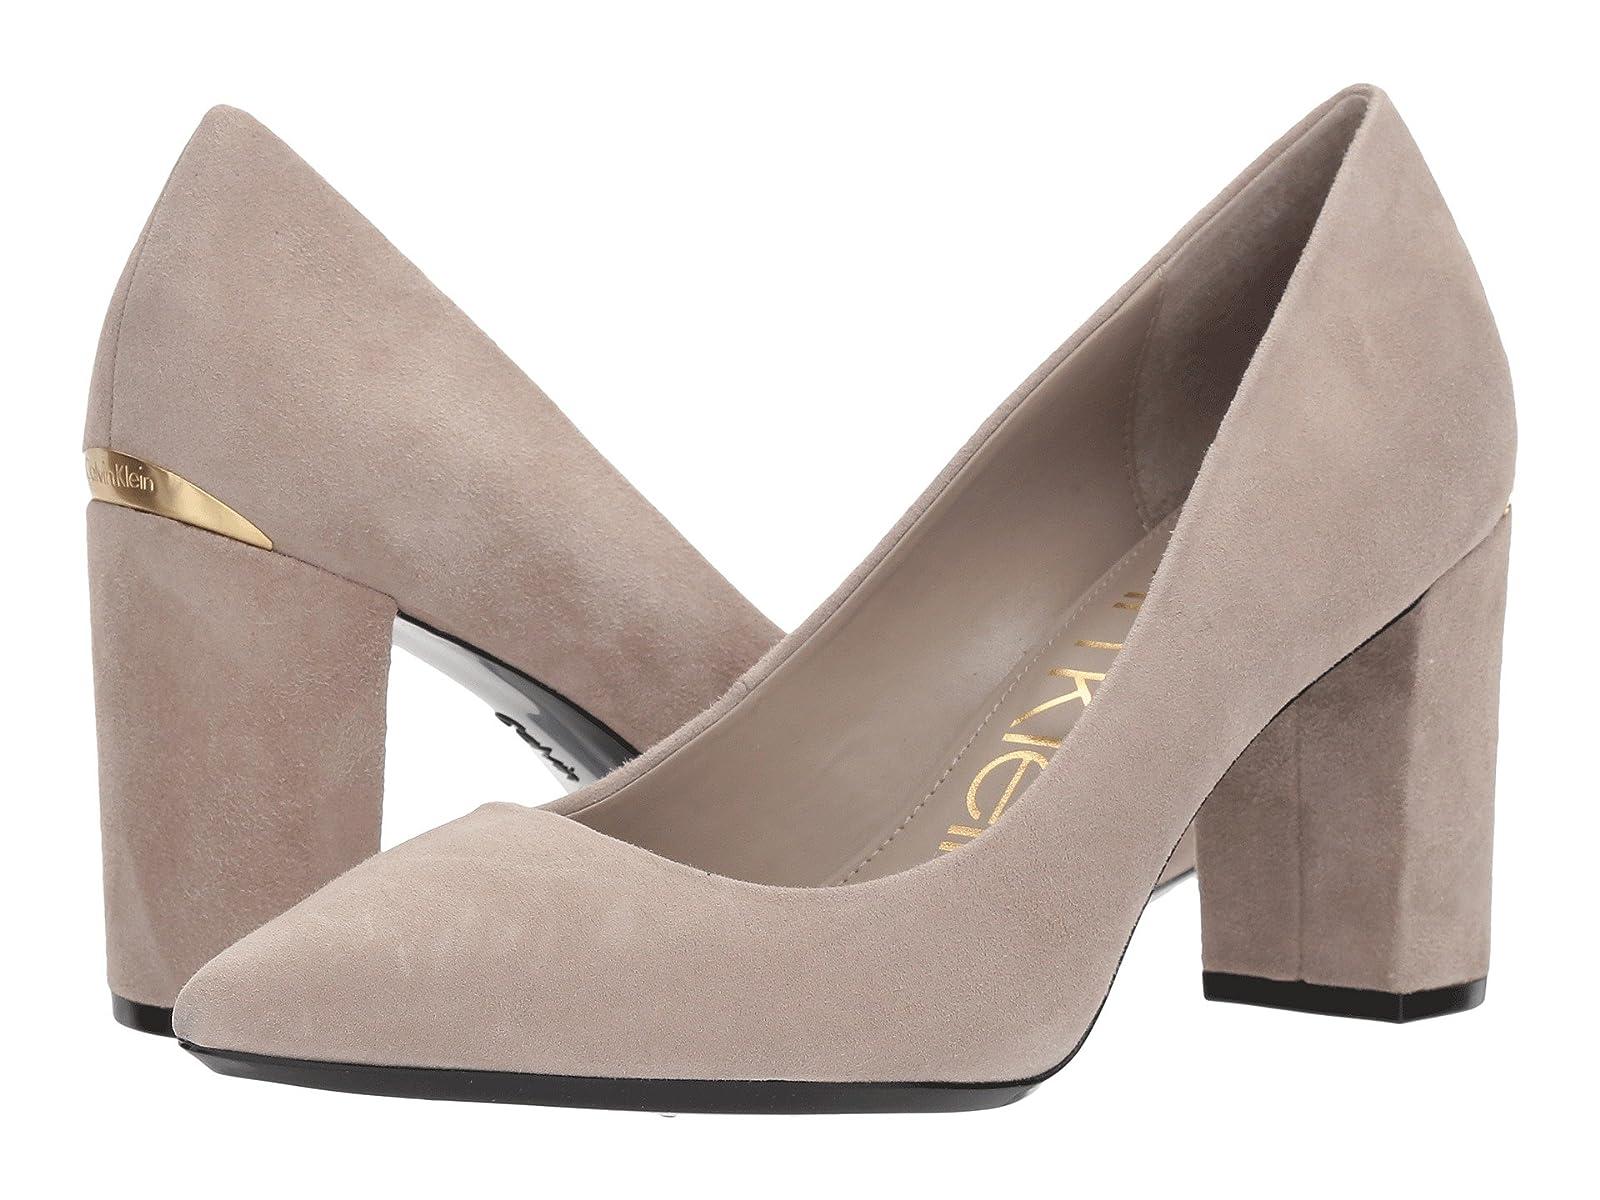 Men's/Women's:Calvin Klein Eviti : : Eviti Up-to-date styling c2ec4b